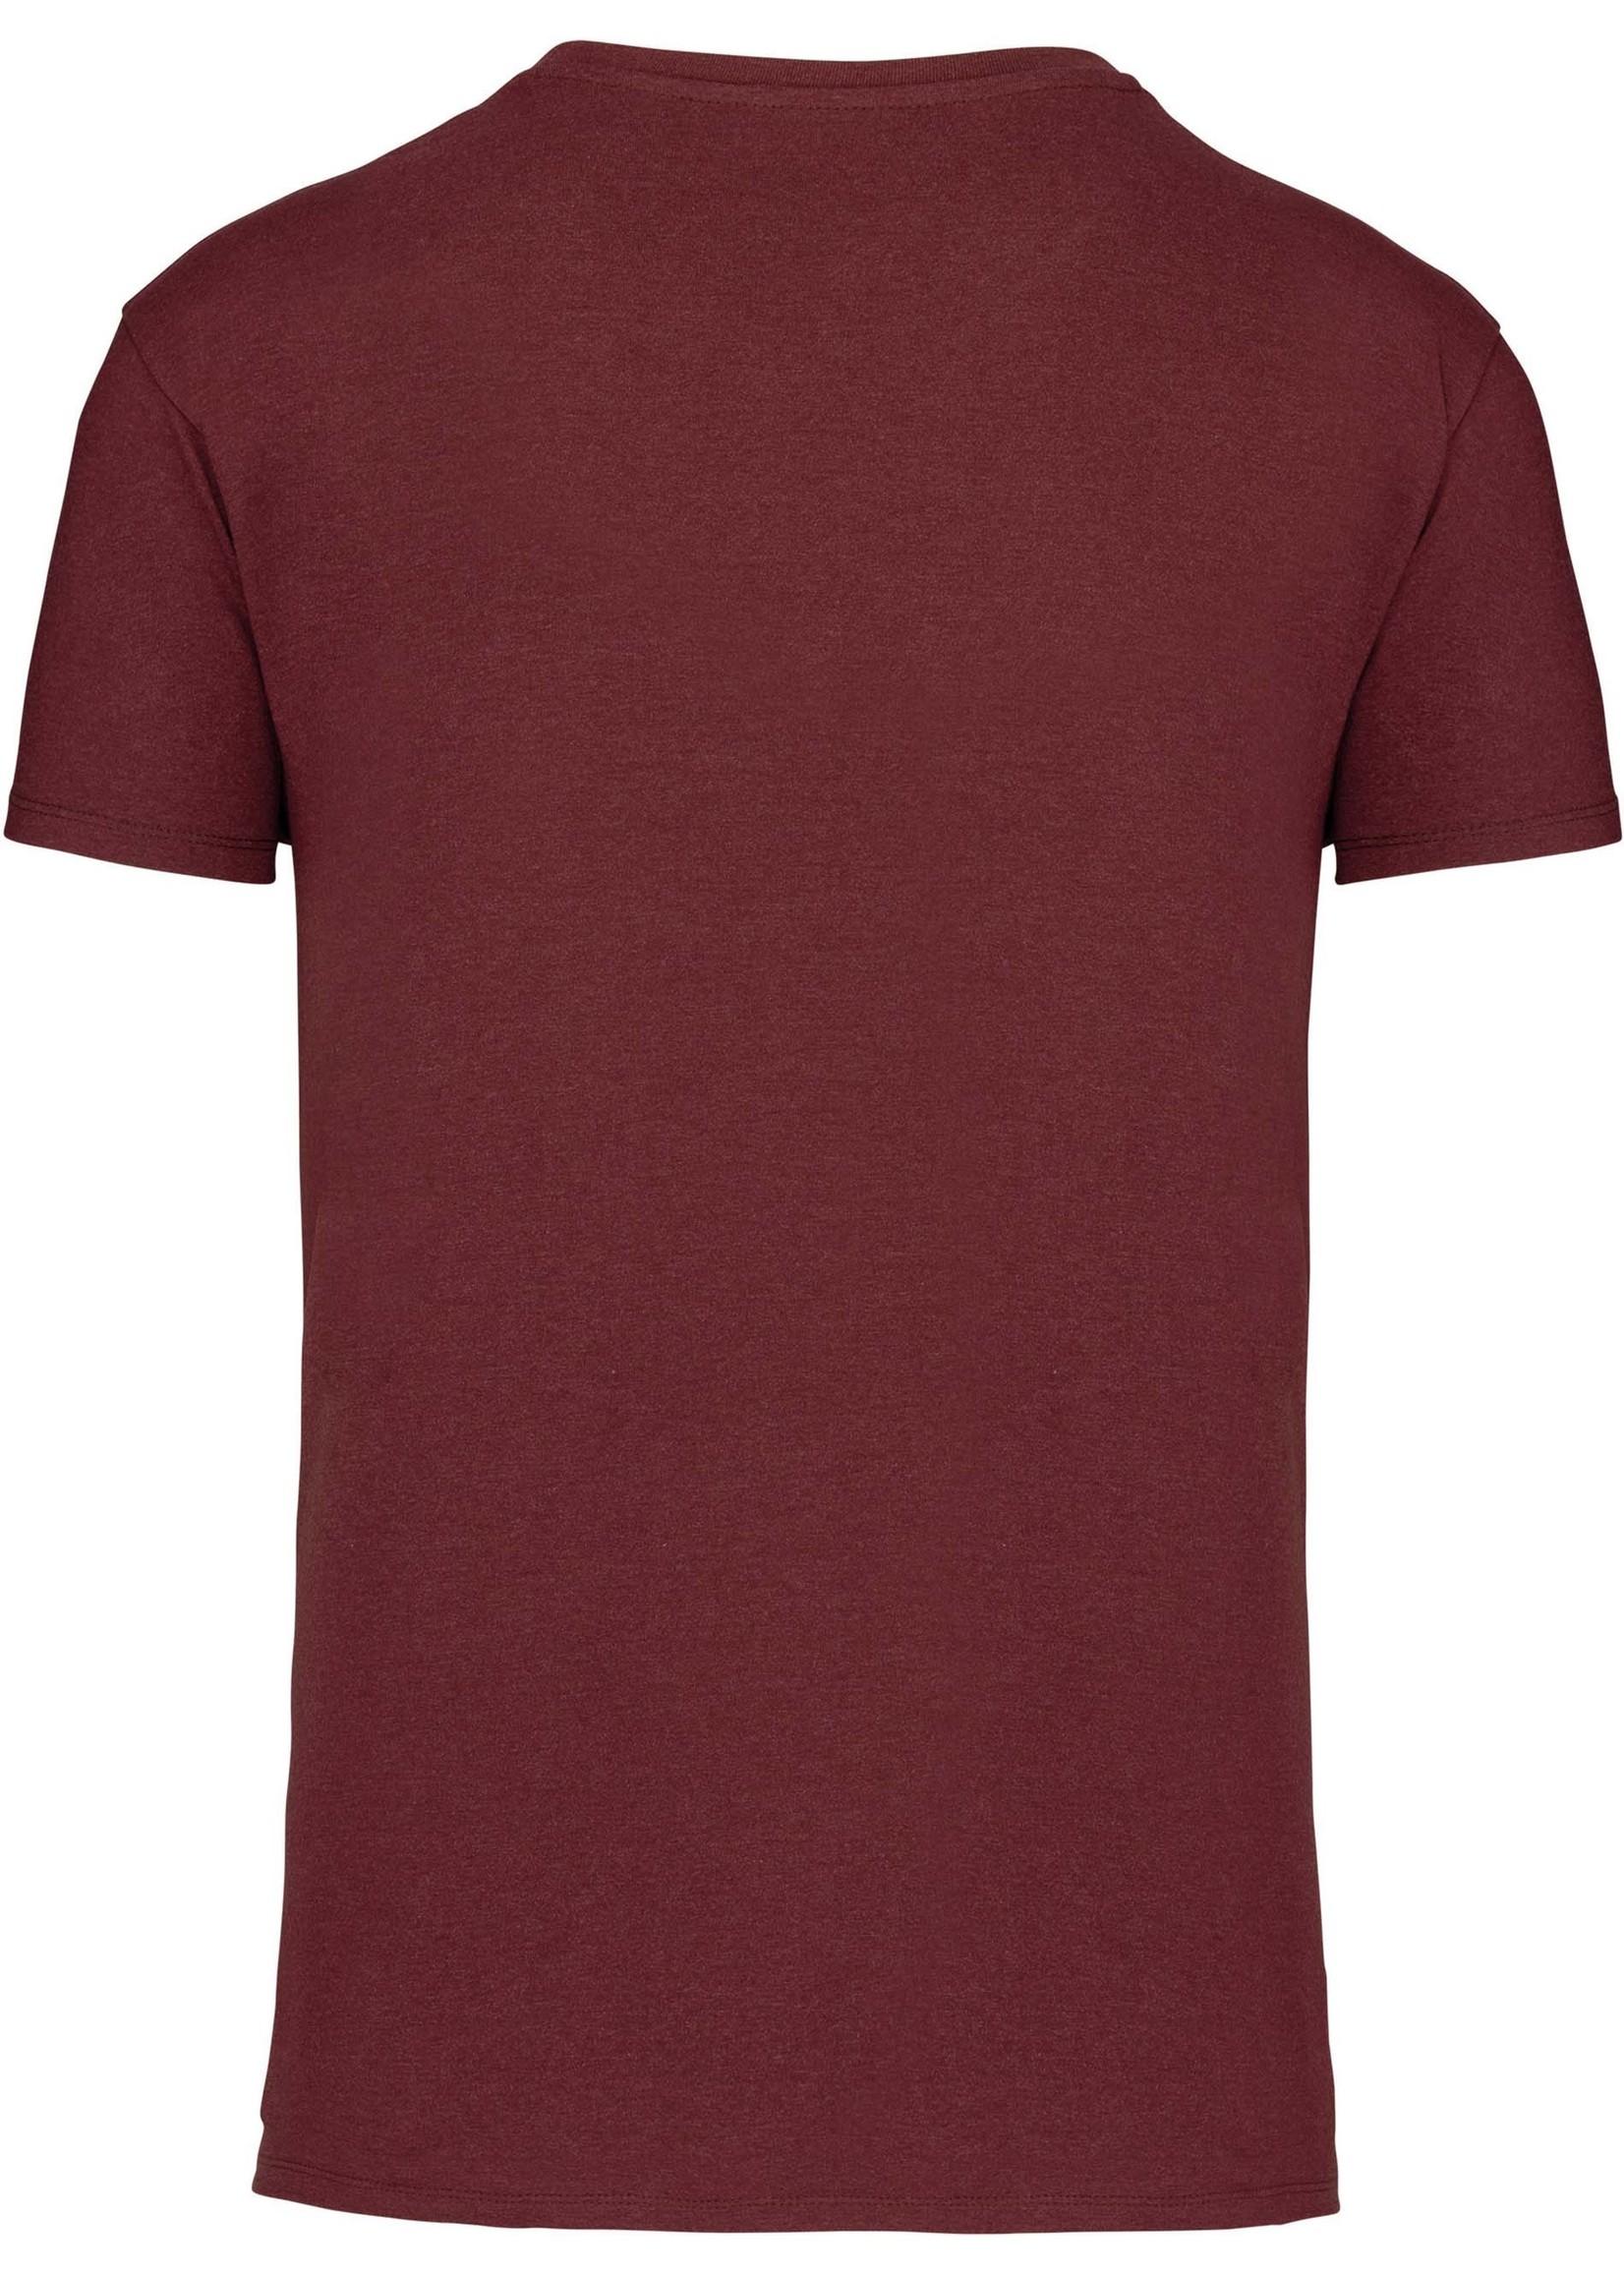 Eco-Friendly Unisex T-shirt - Whine Heather